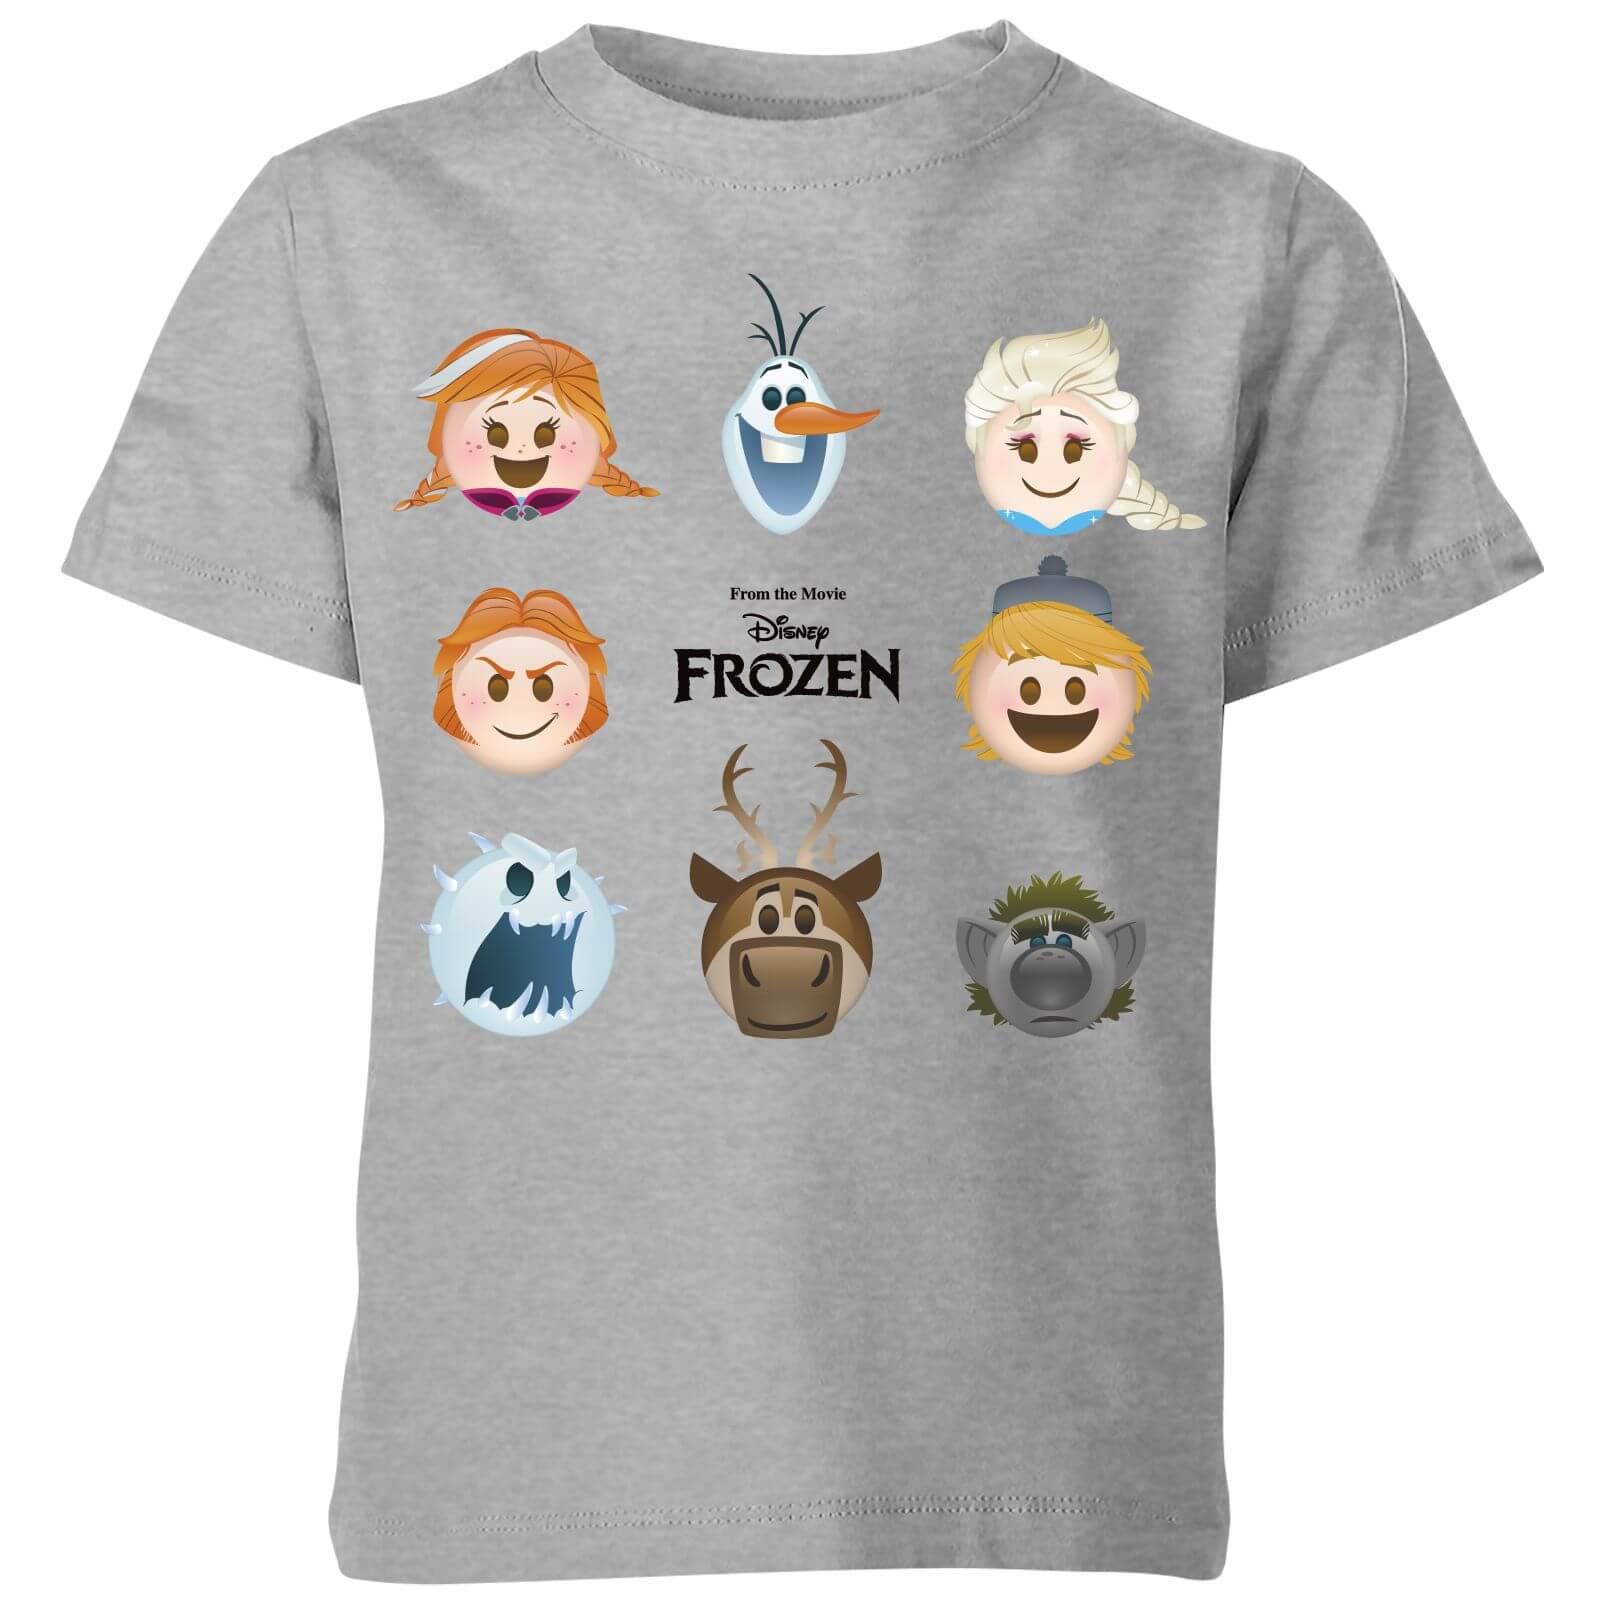 30% korting + gratis verzending op officiële Disney kleding @ Zavvi